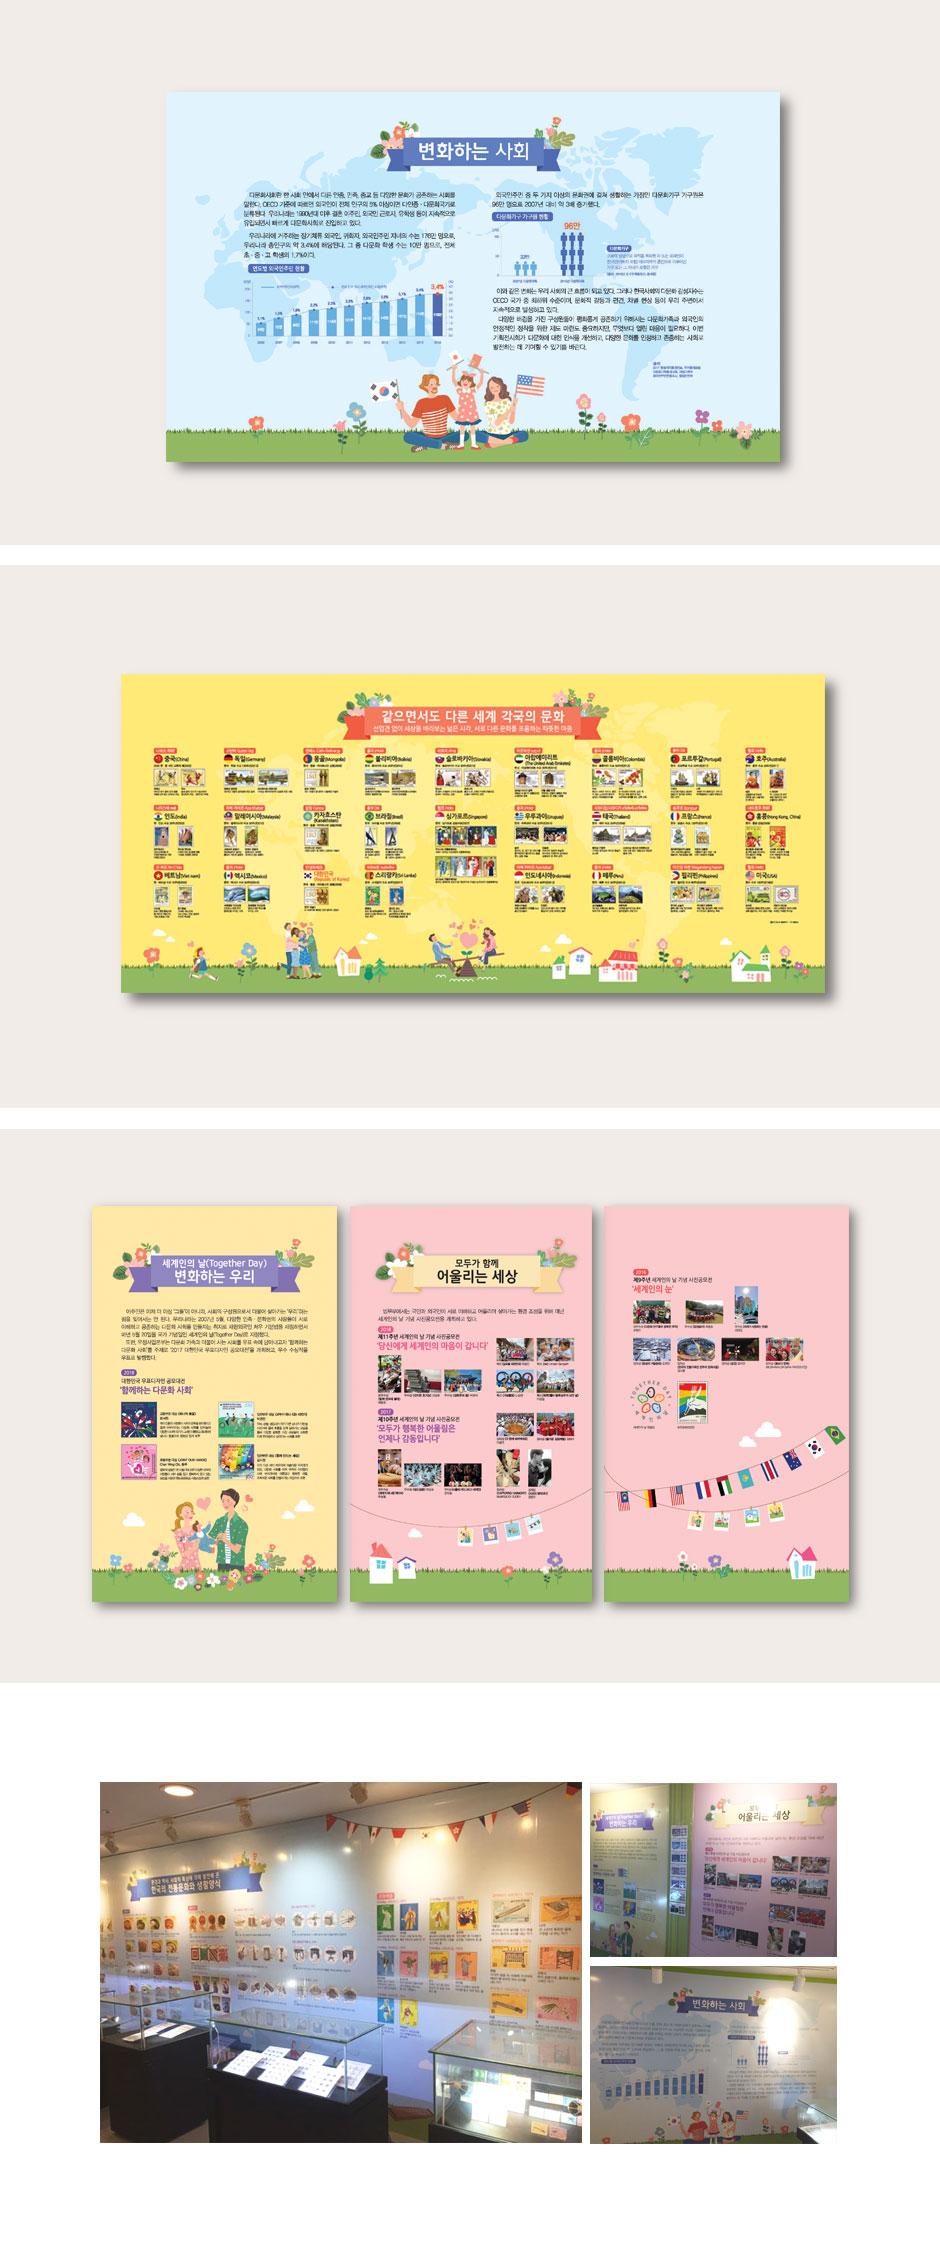 2018_Korea Postal Service Agency 2018 World Day Stamps history exhibition banner design